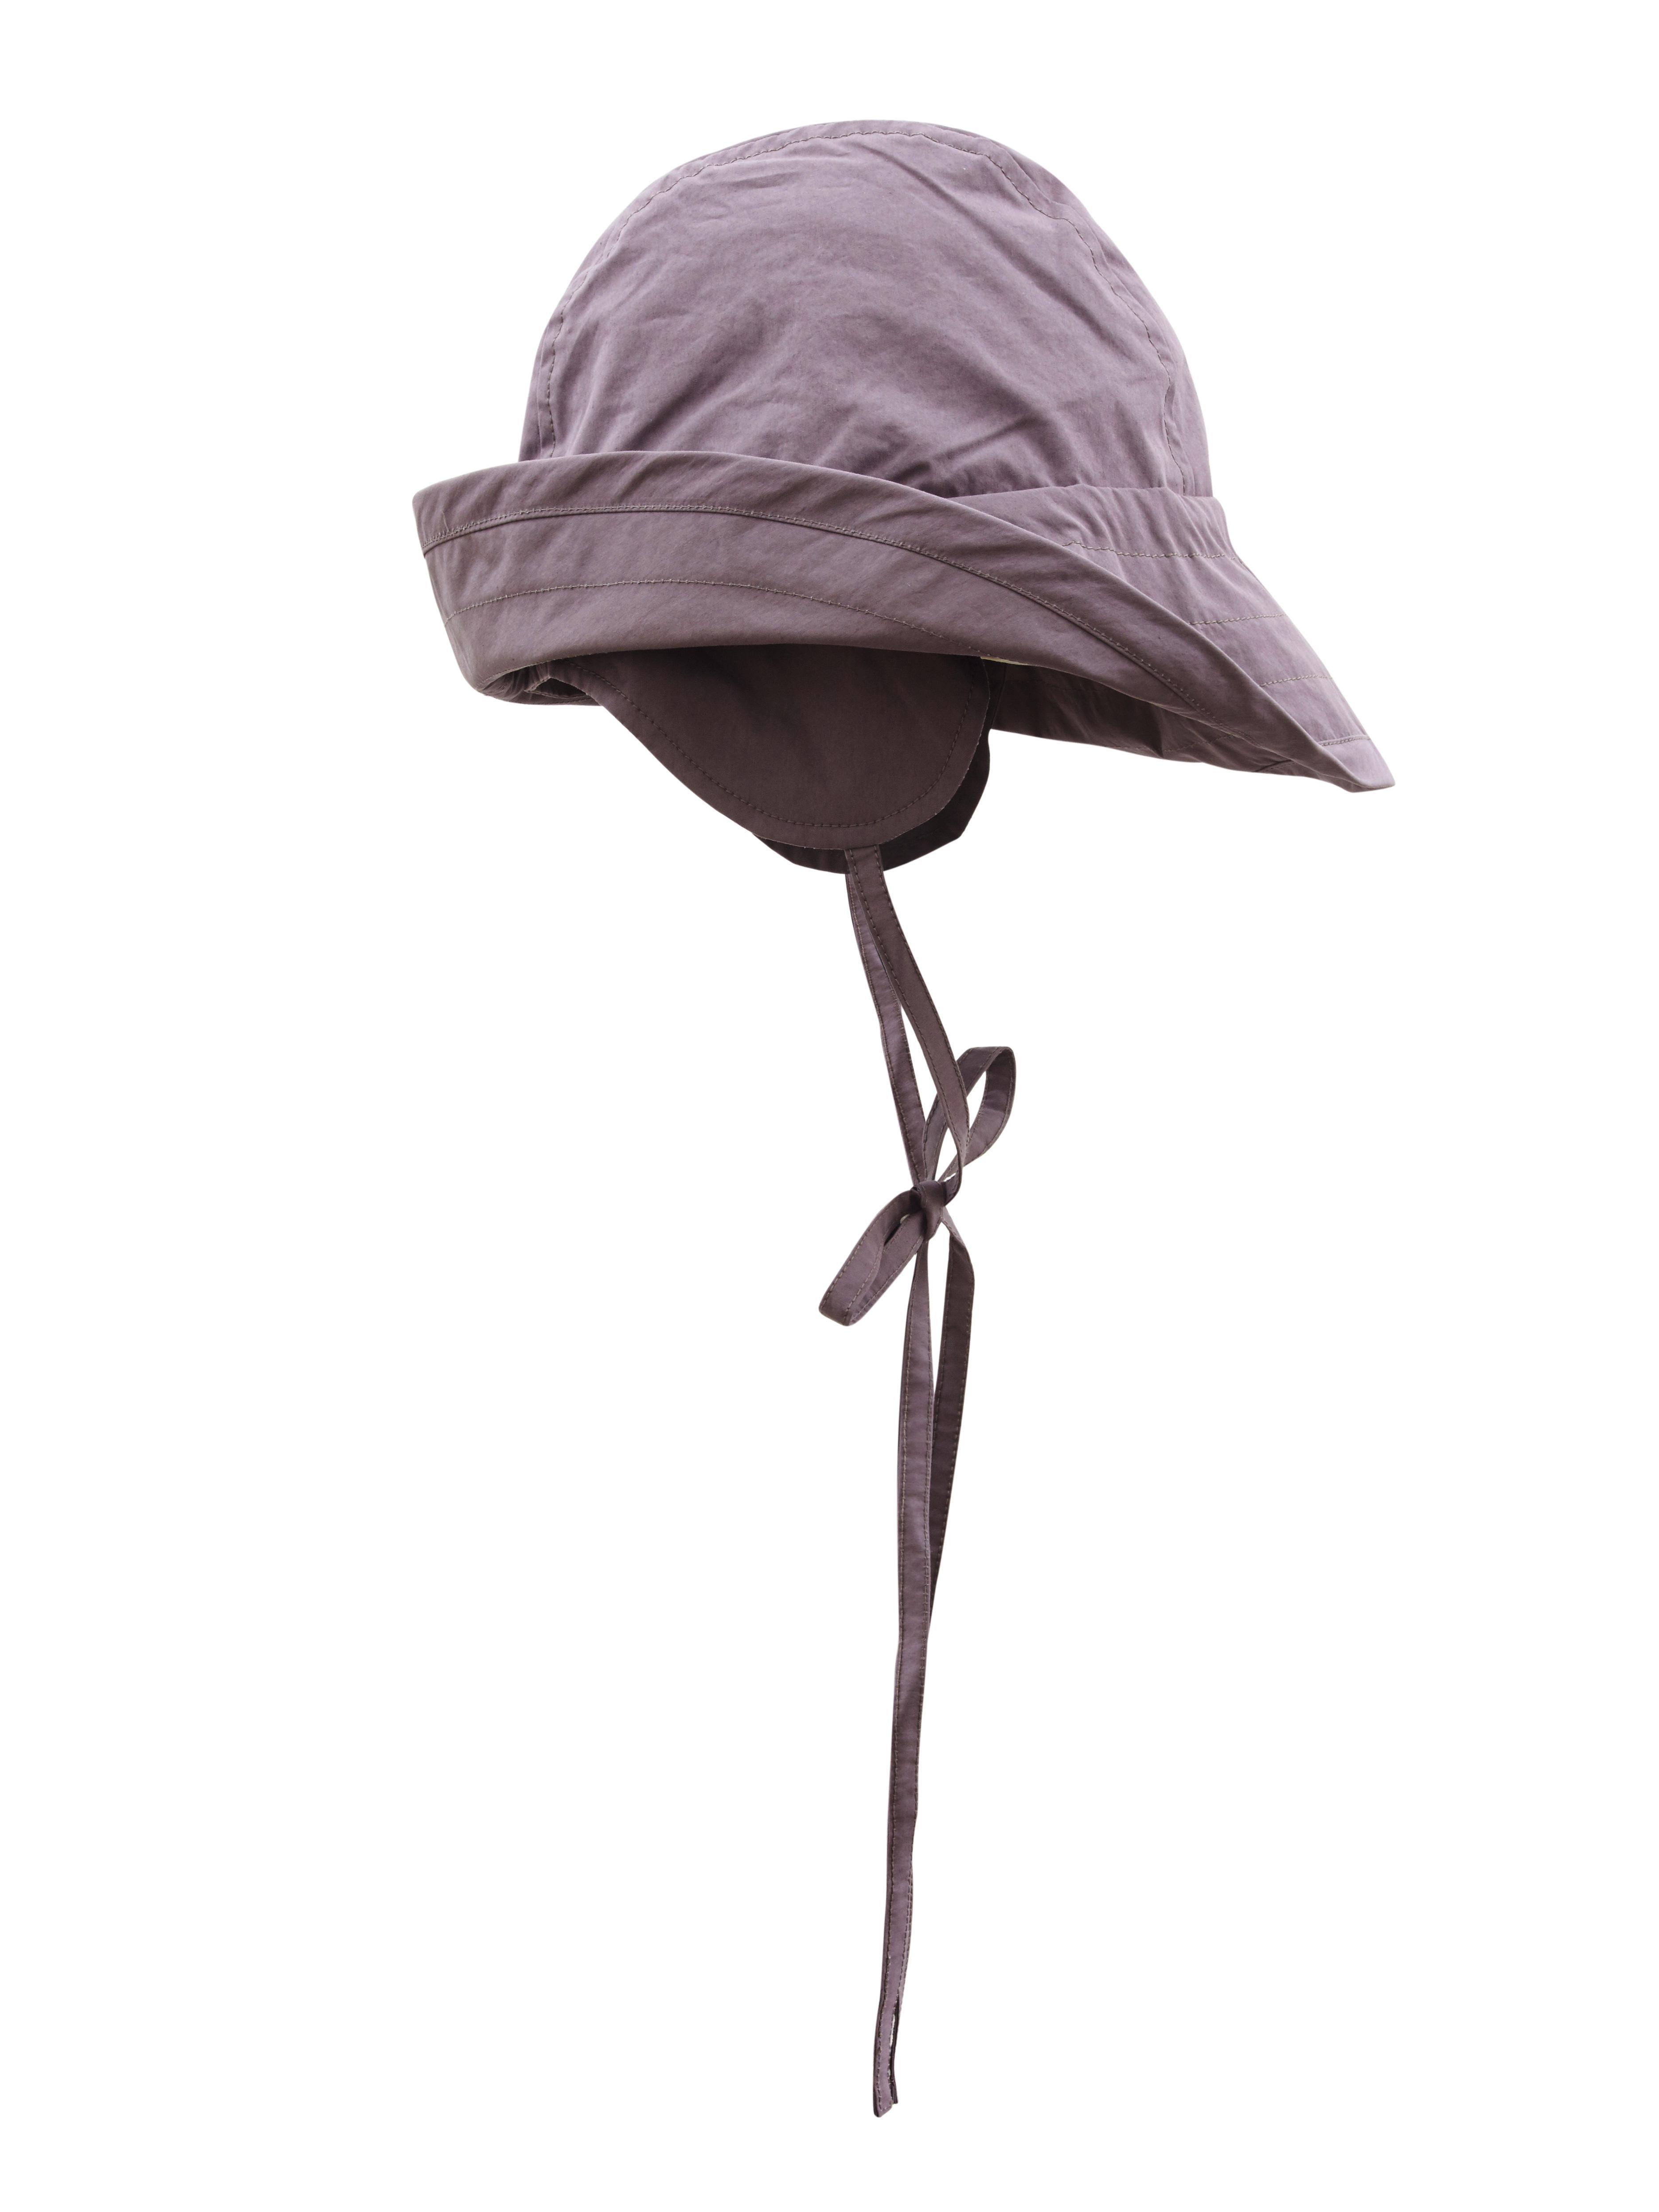 uk lyst craig green bucket hat for men 11236 723e8 5d1a456faae1